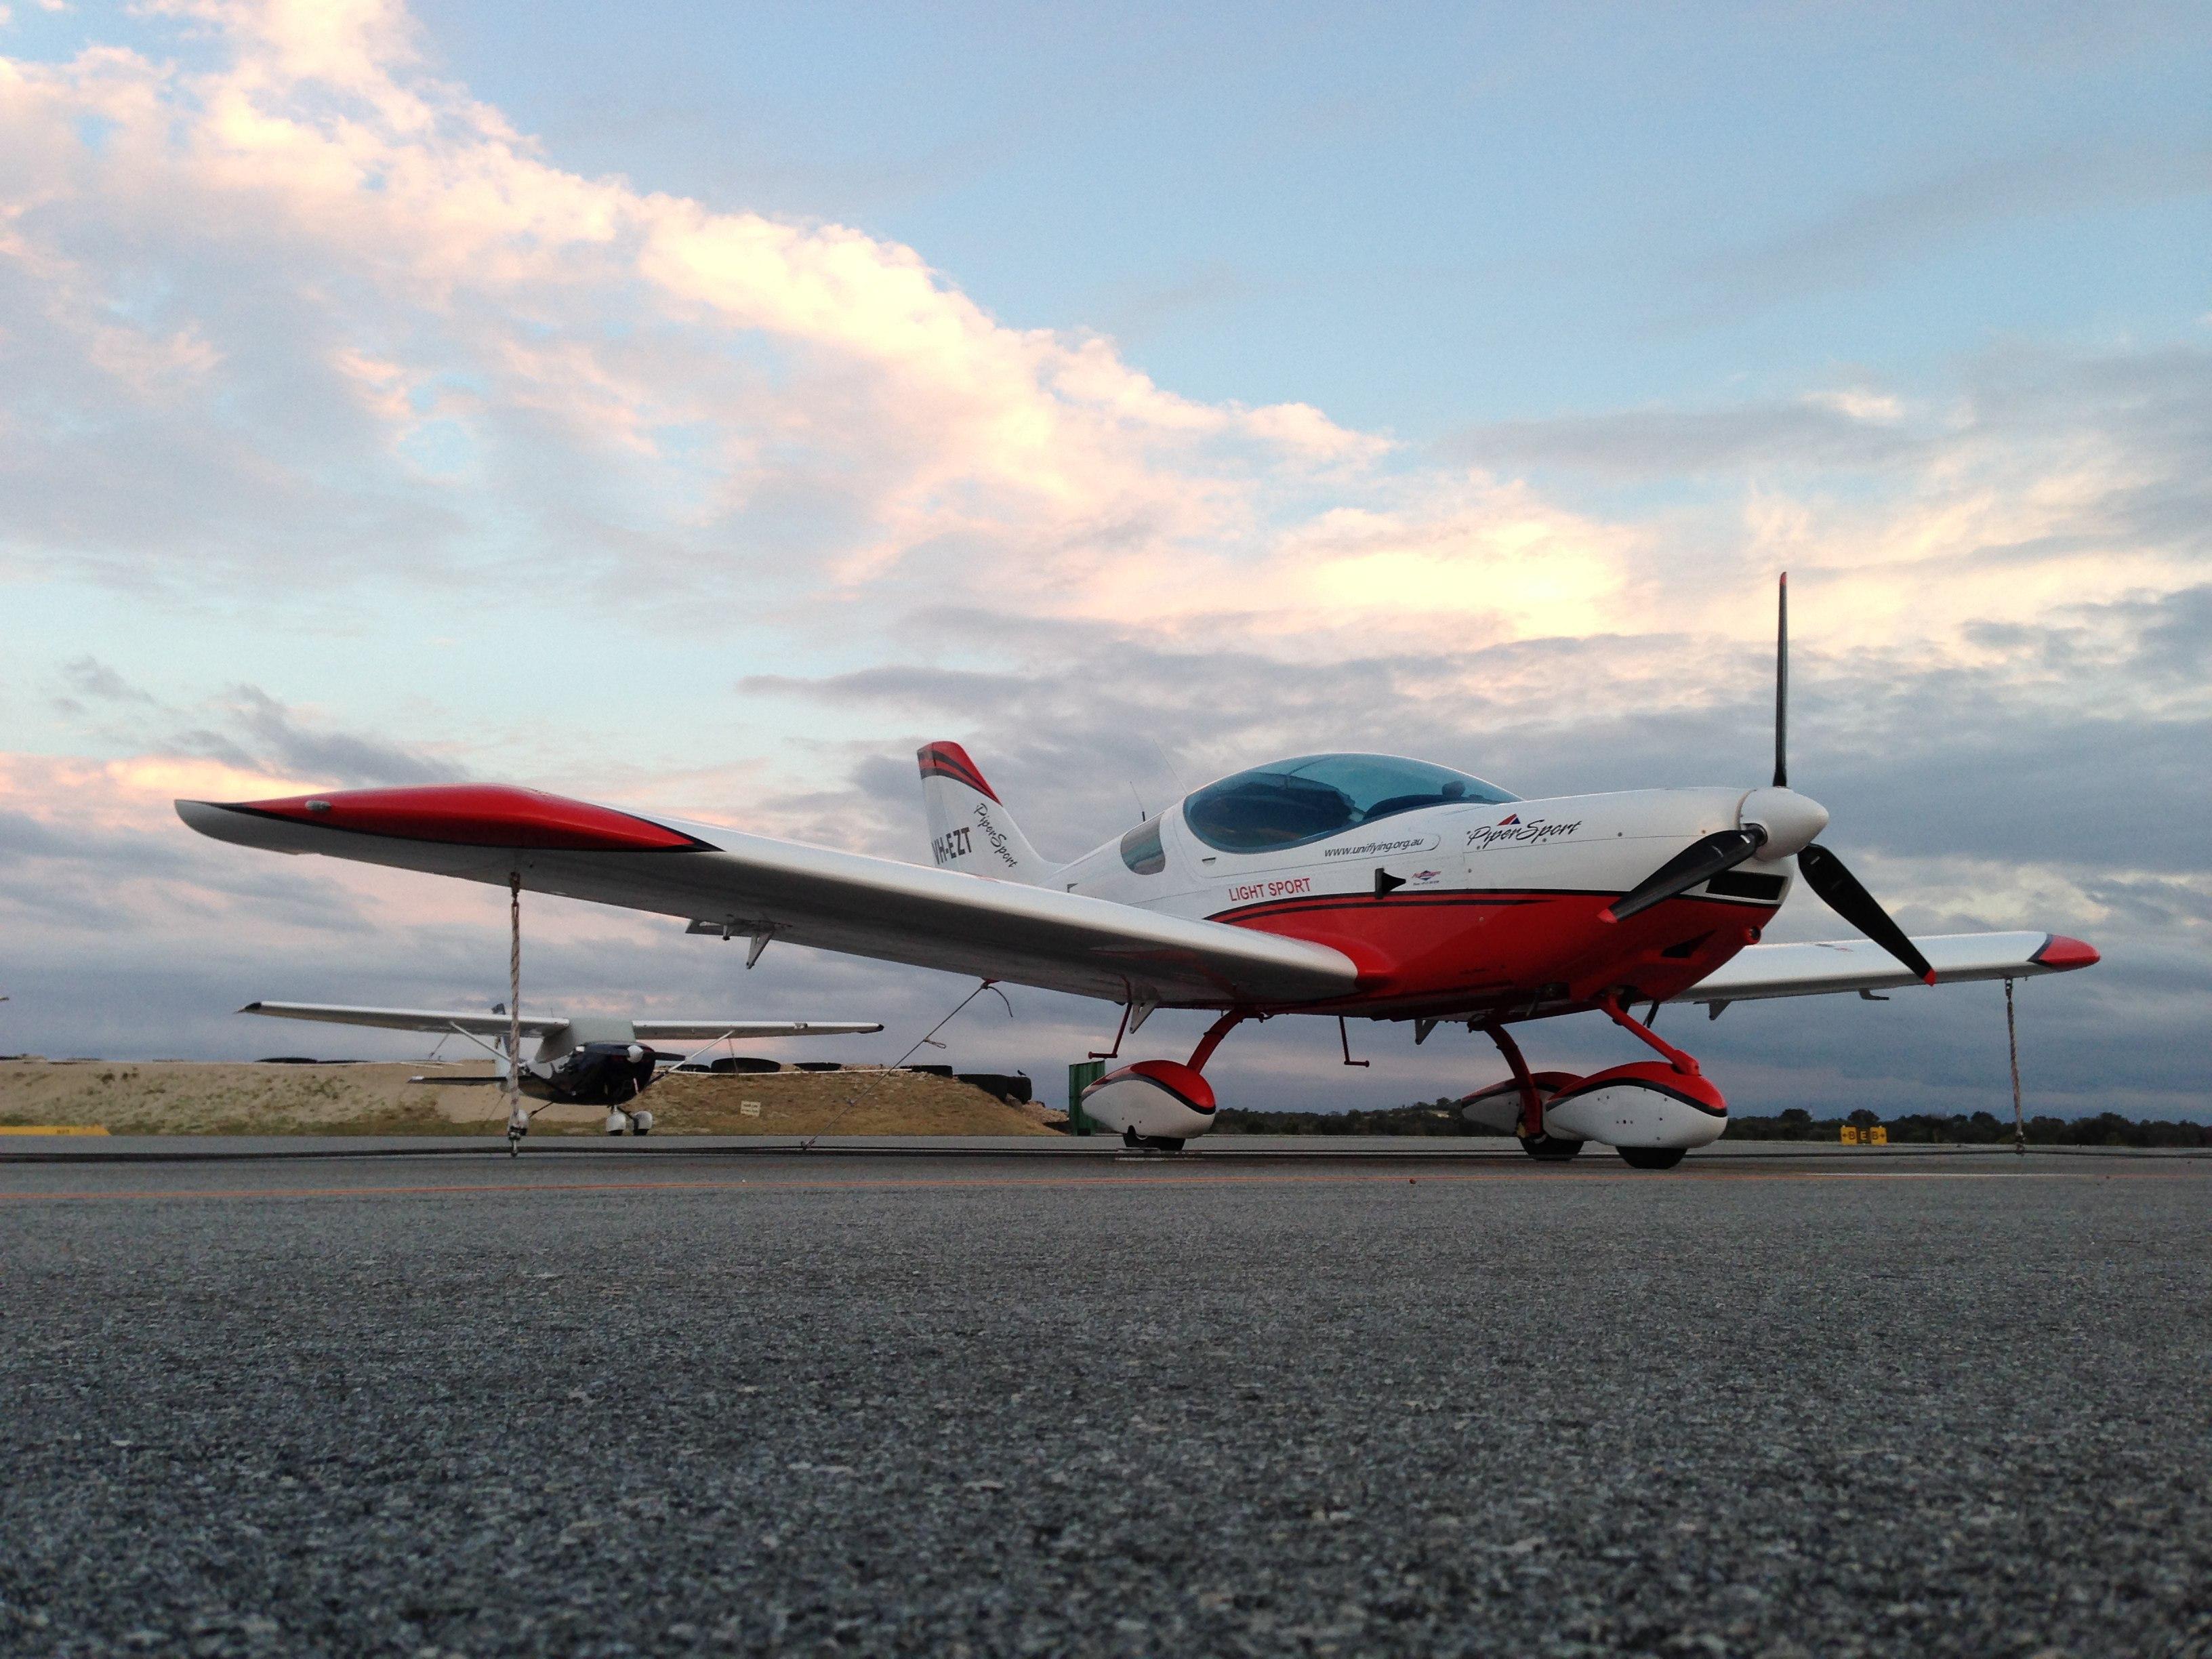 VH-EZT CSA pipersport sportscruiser parked at jandakot sunset